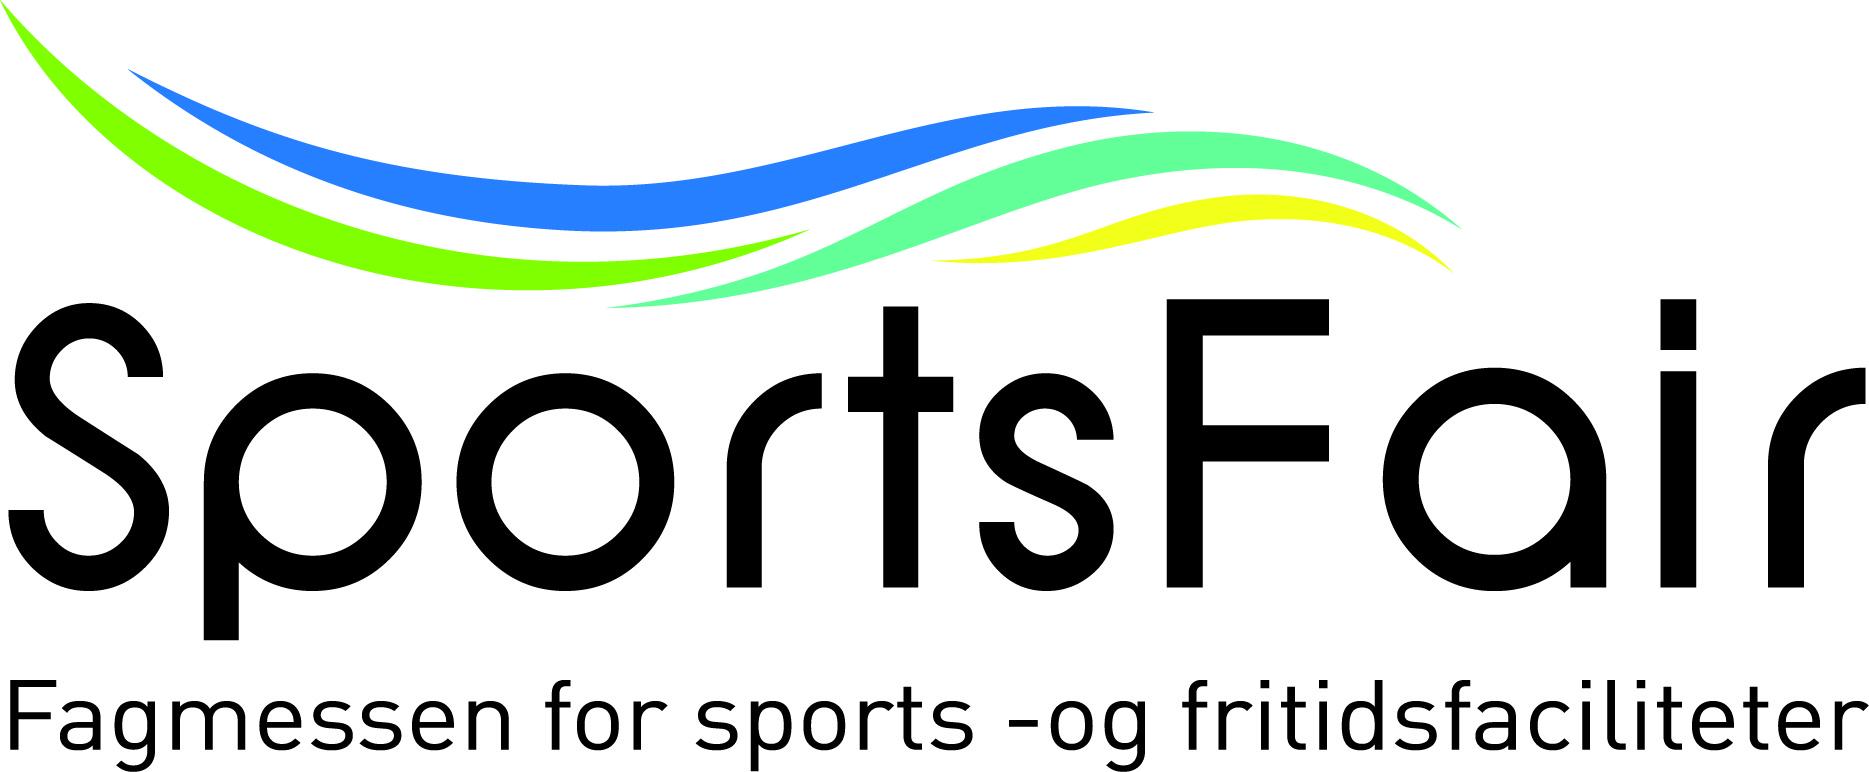 SportsFair_logo.jpg